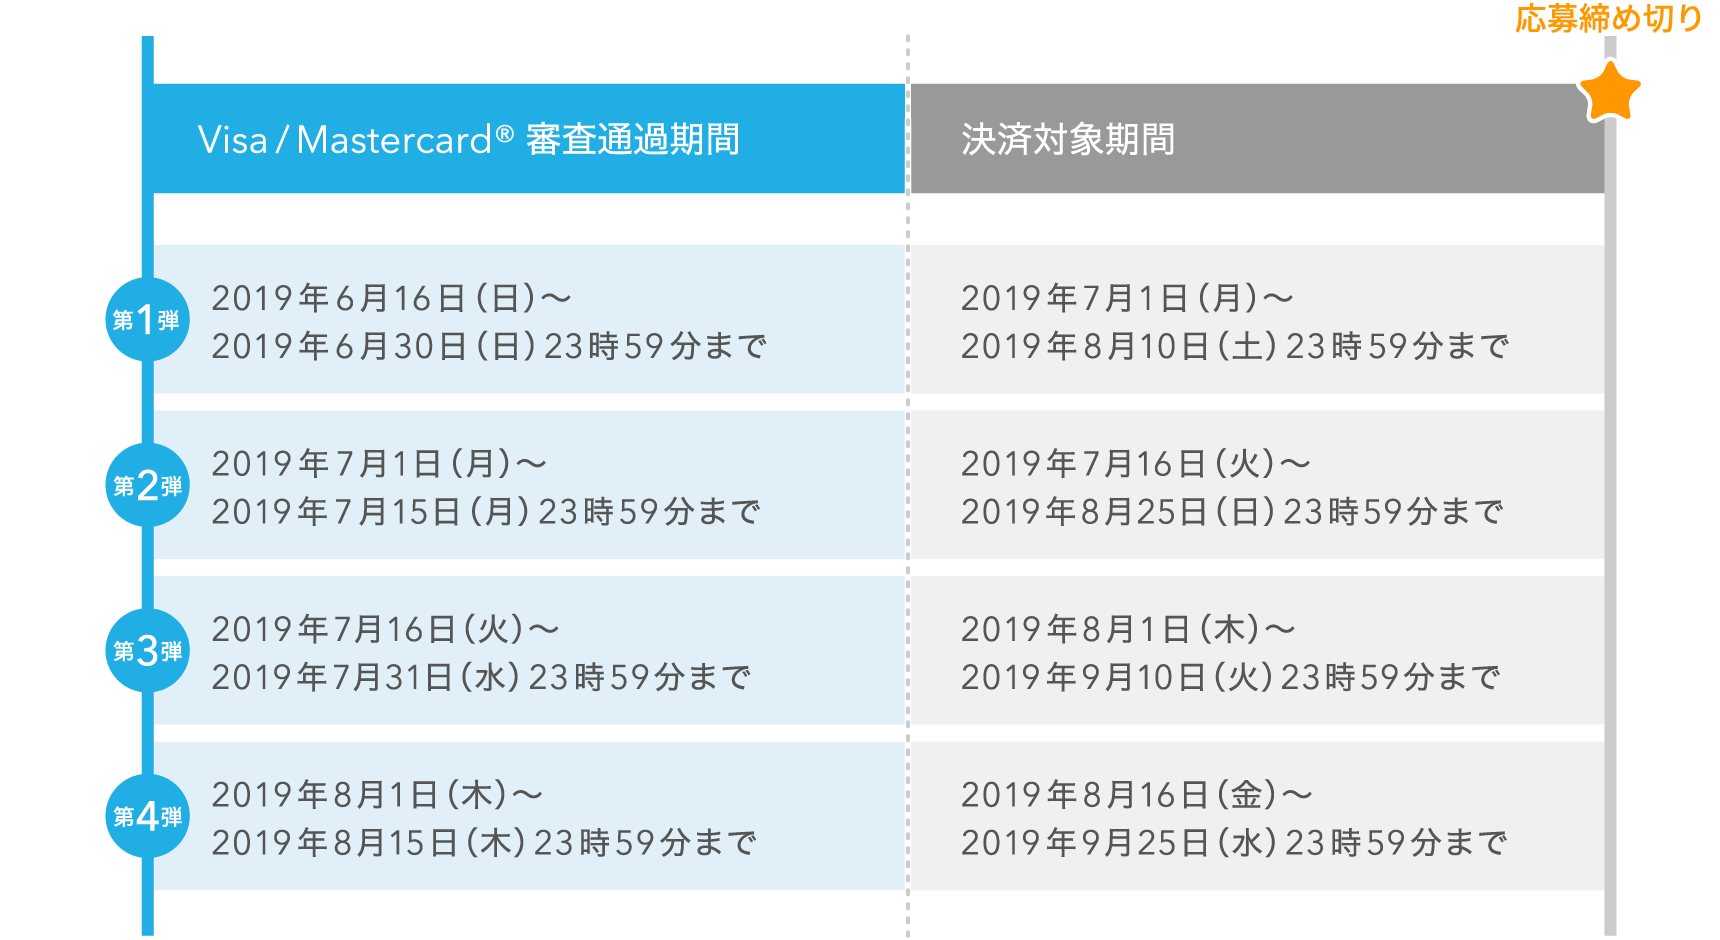 Visa/Mastercard® 審査通過期間 決済対象期間